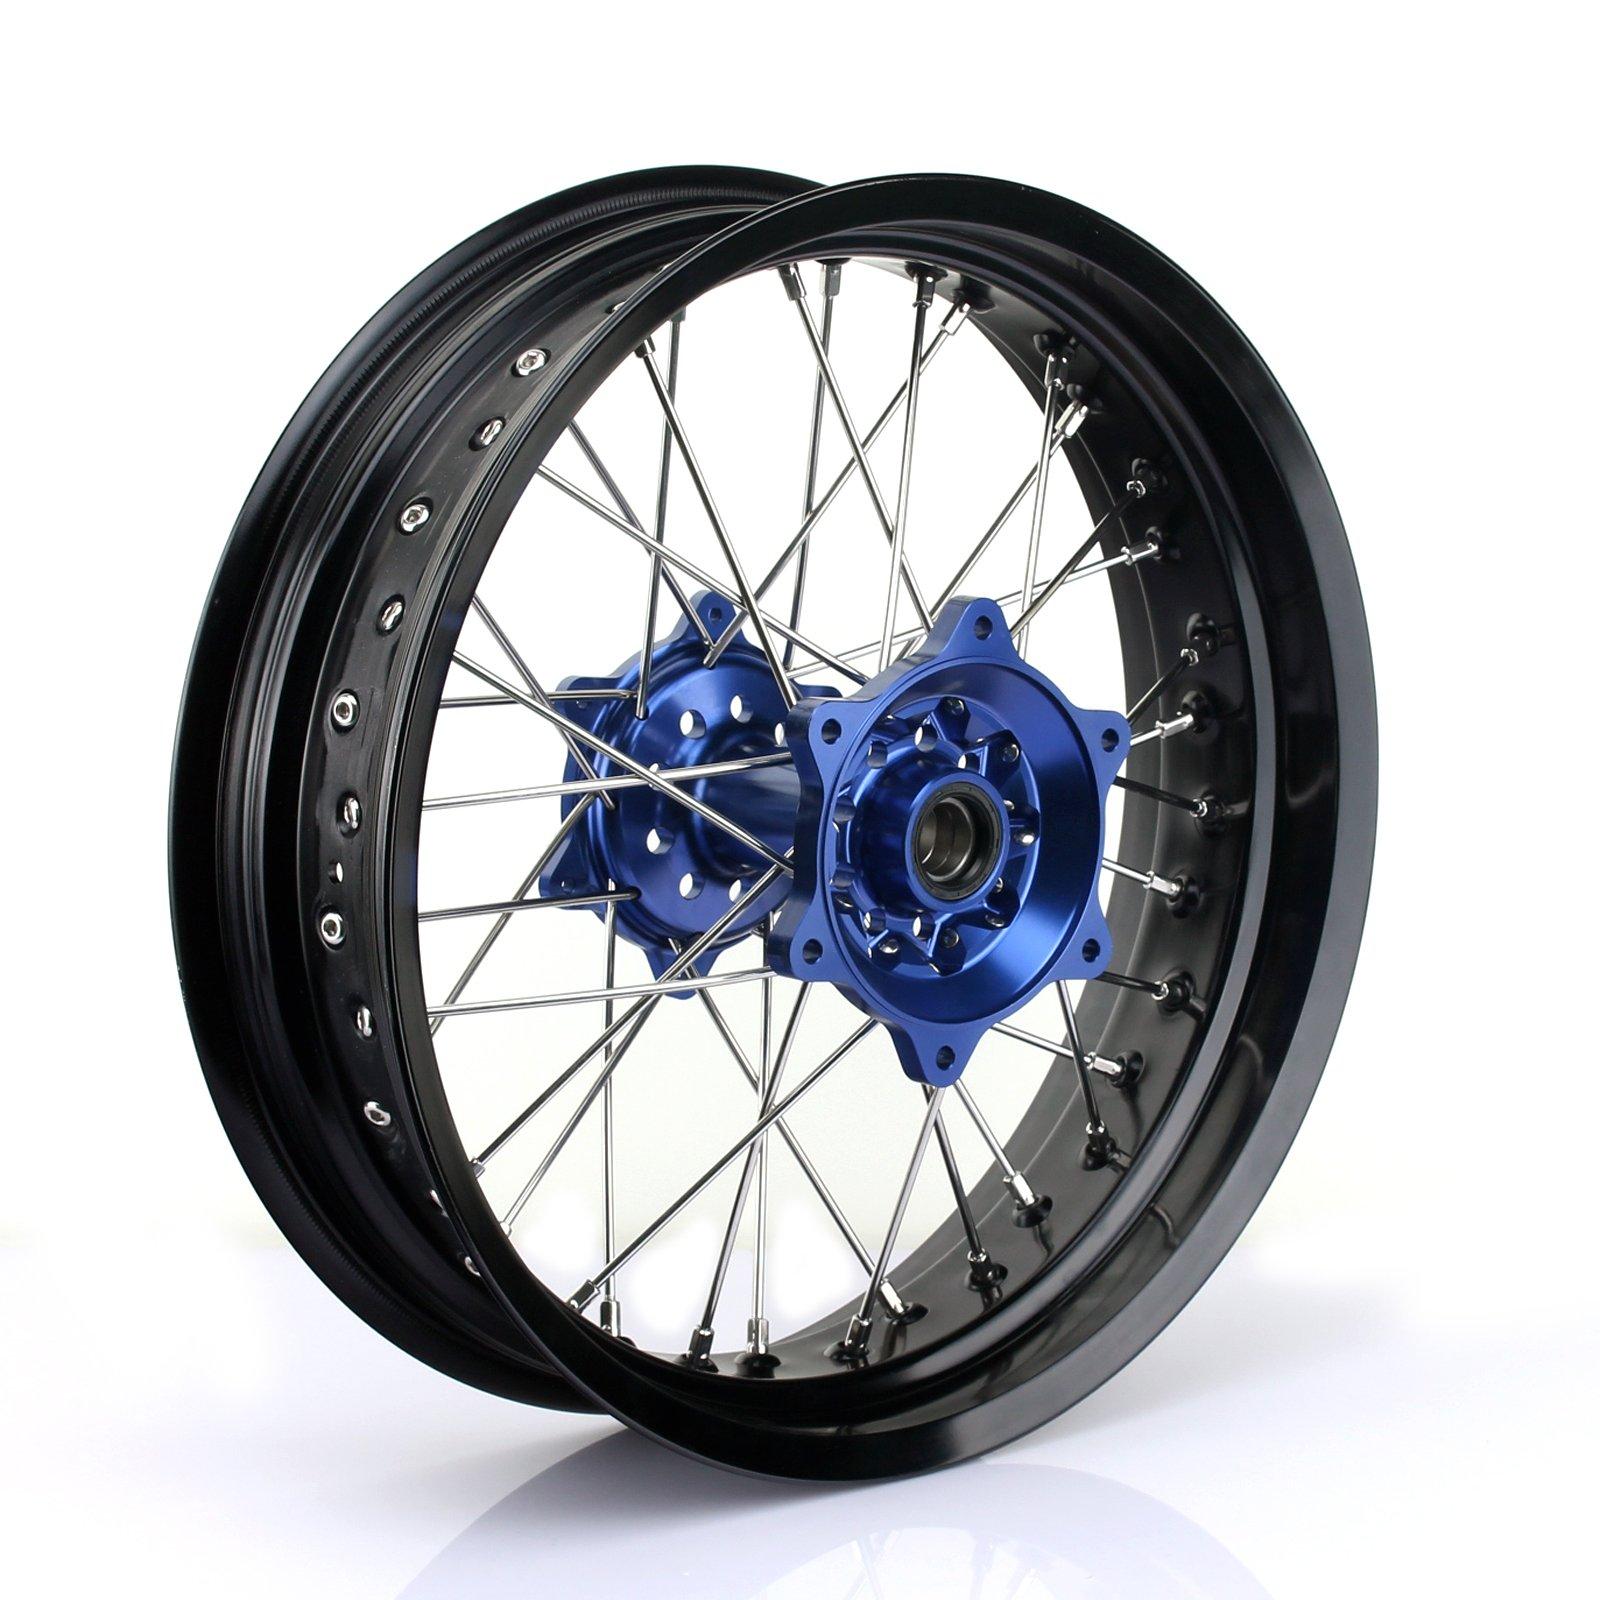 TARAZON 17''x4.25'' Supermoto Rear Complete Wheel Set Rim Spokes Blue Hub for Yamaha YZ250F YZF250 YZ450F YZF450 2009-2017